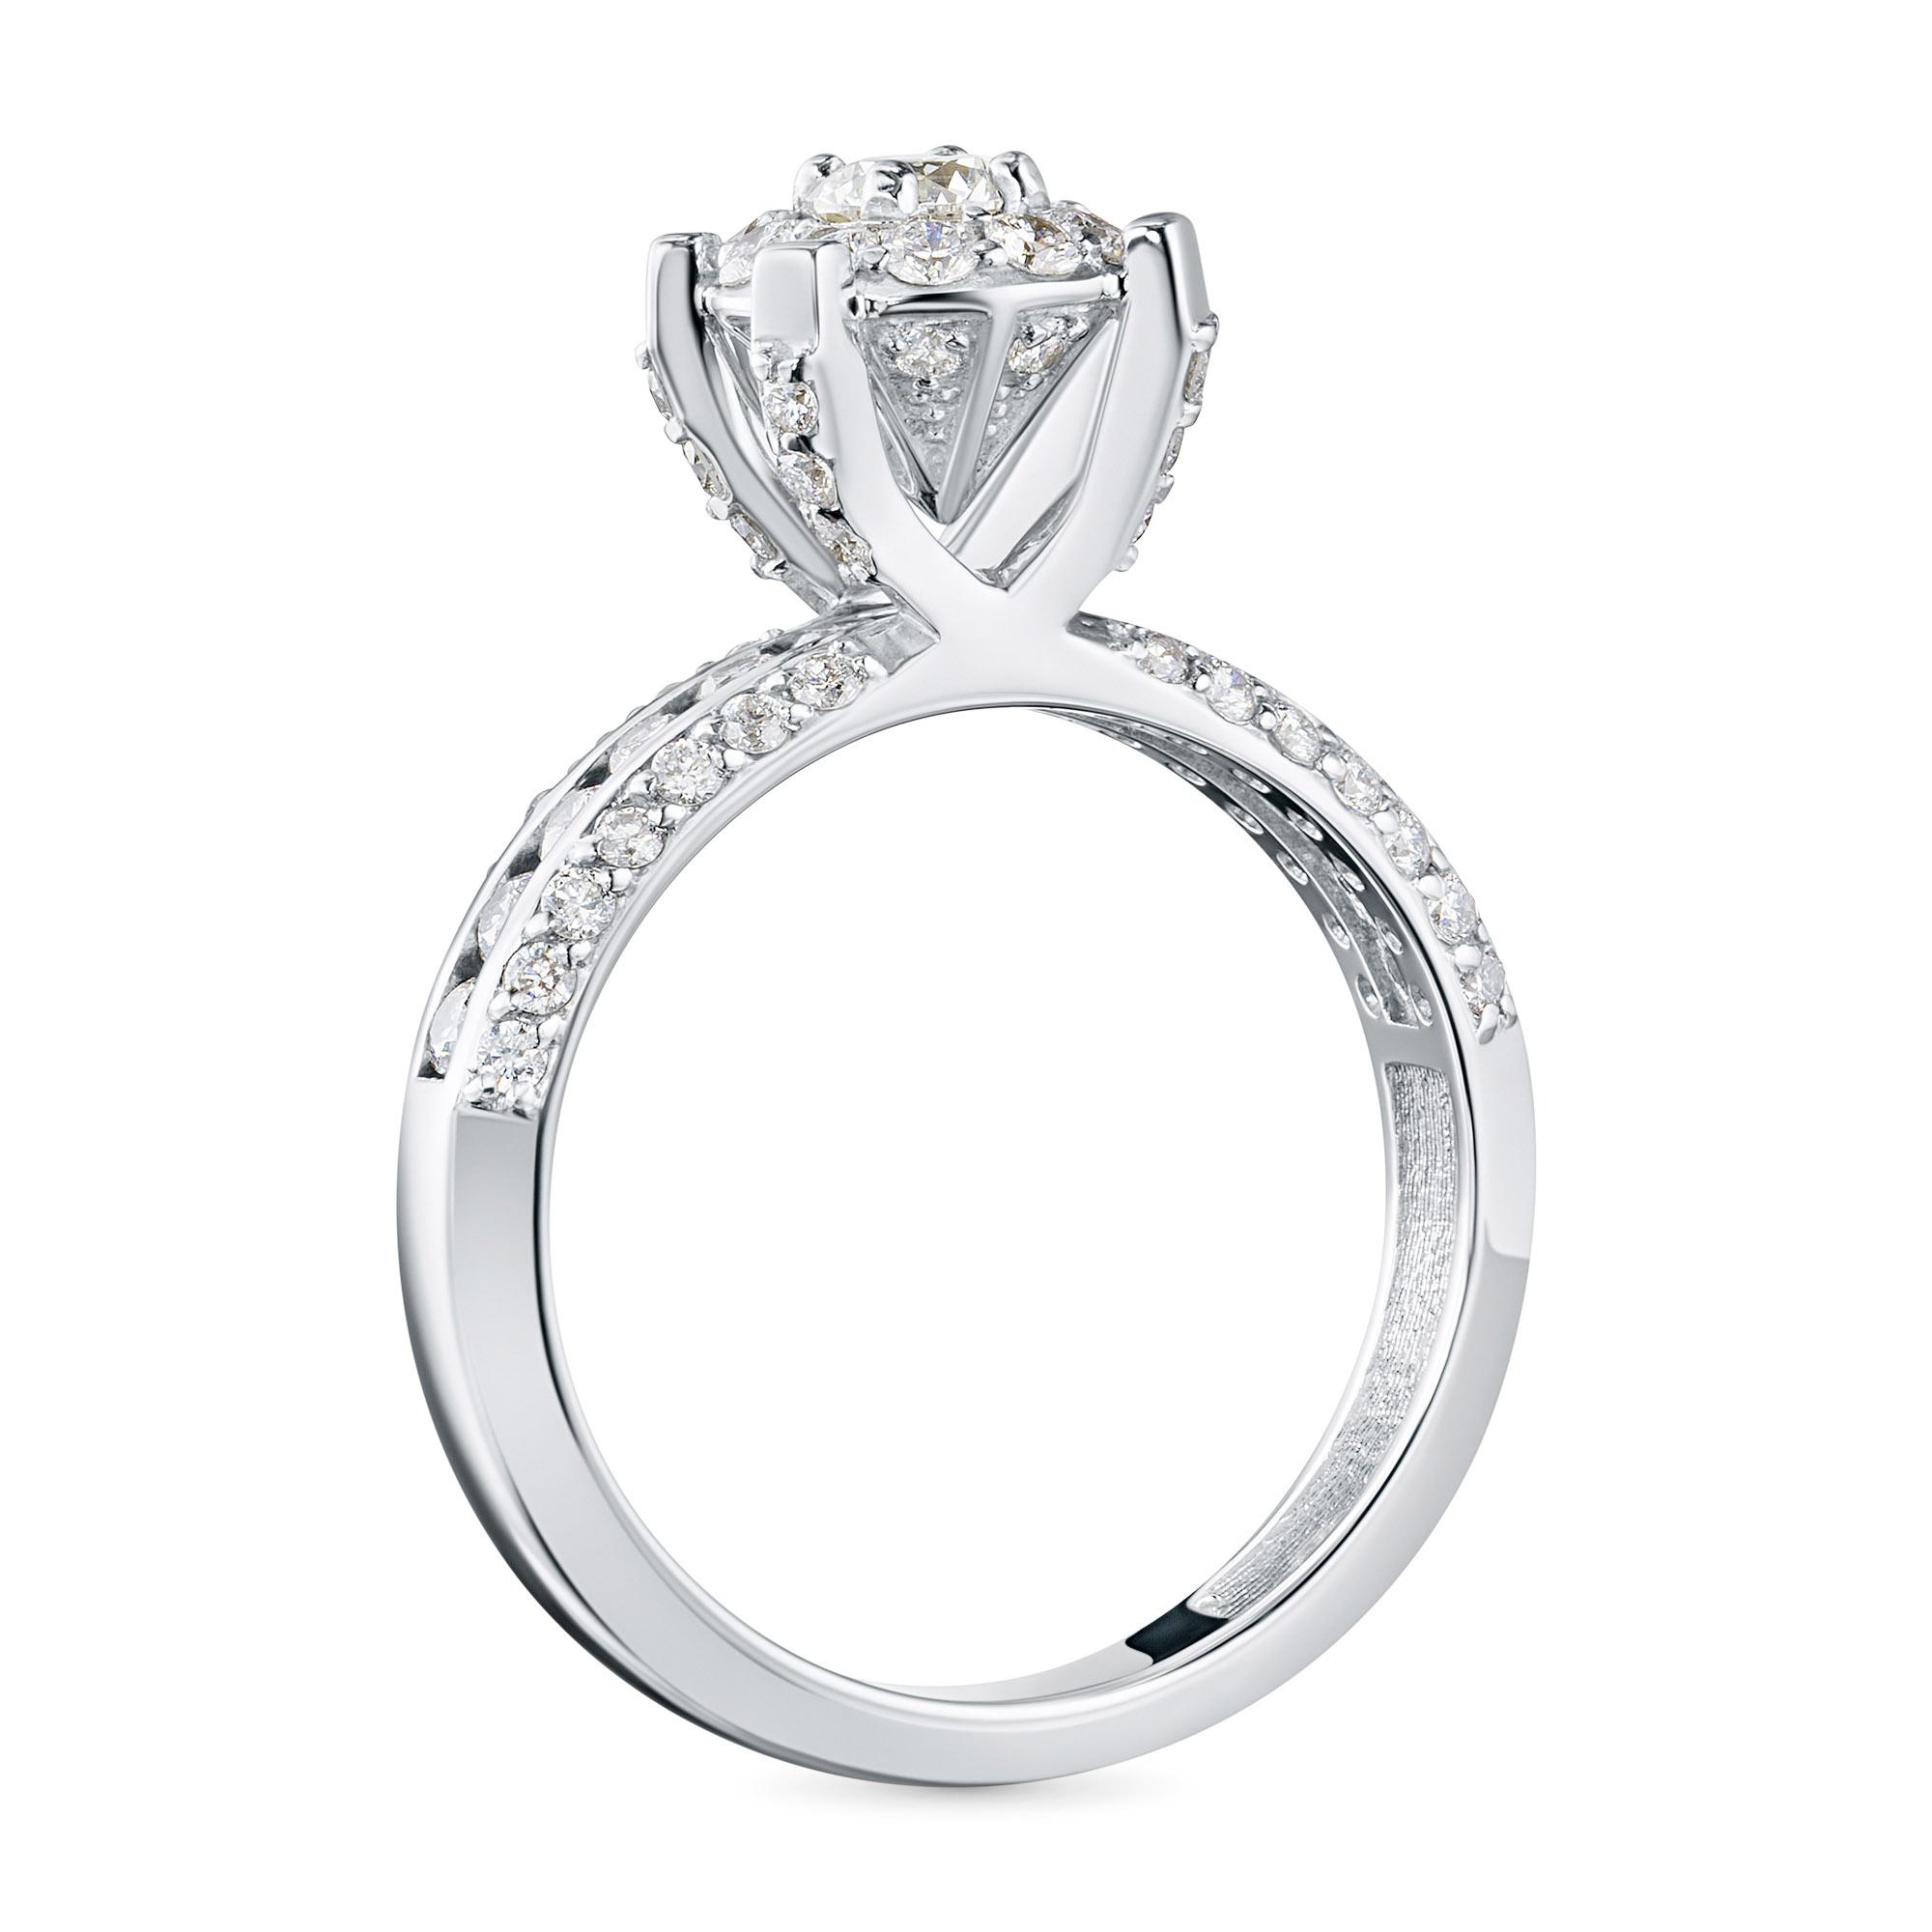 Кольцо из золота с бриллиантами э0901кц042103783